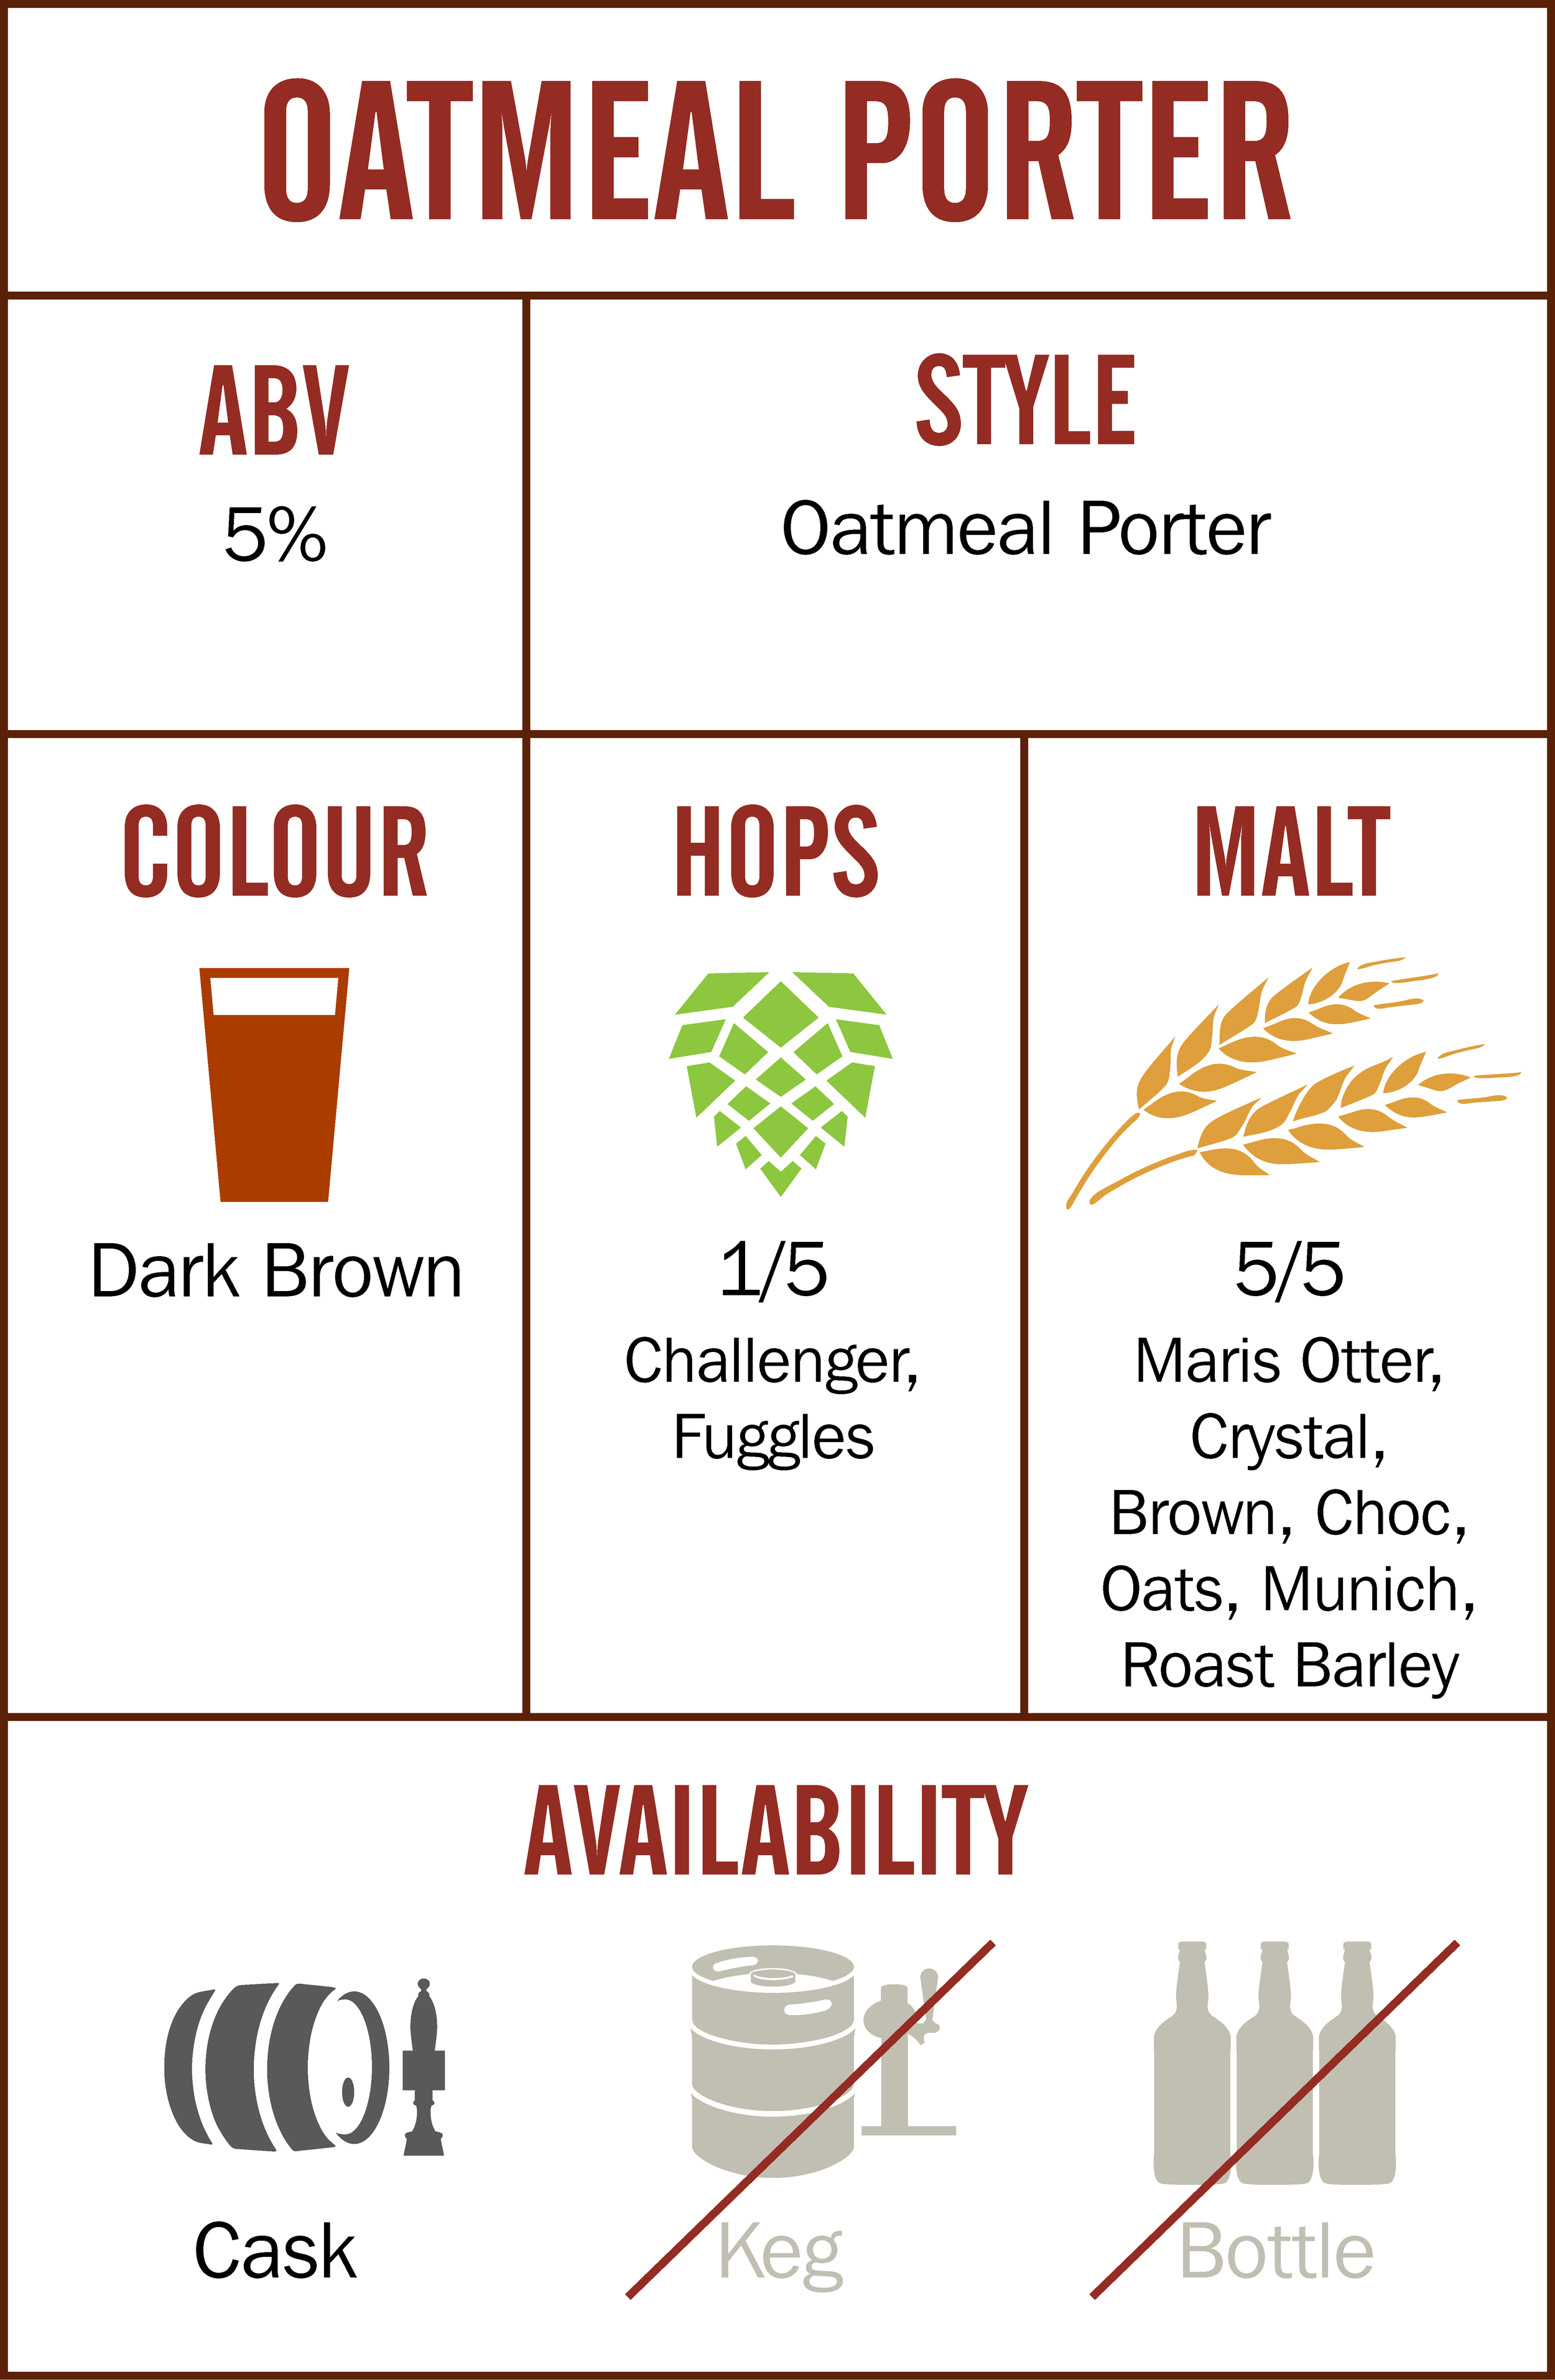 BBF Oatmeal Porter